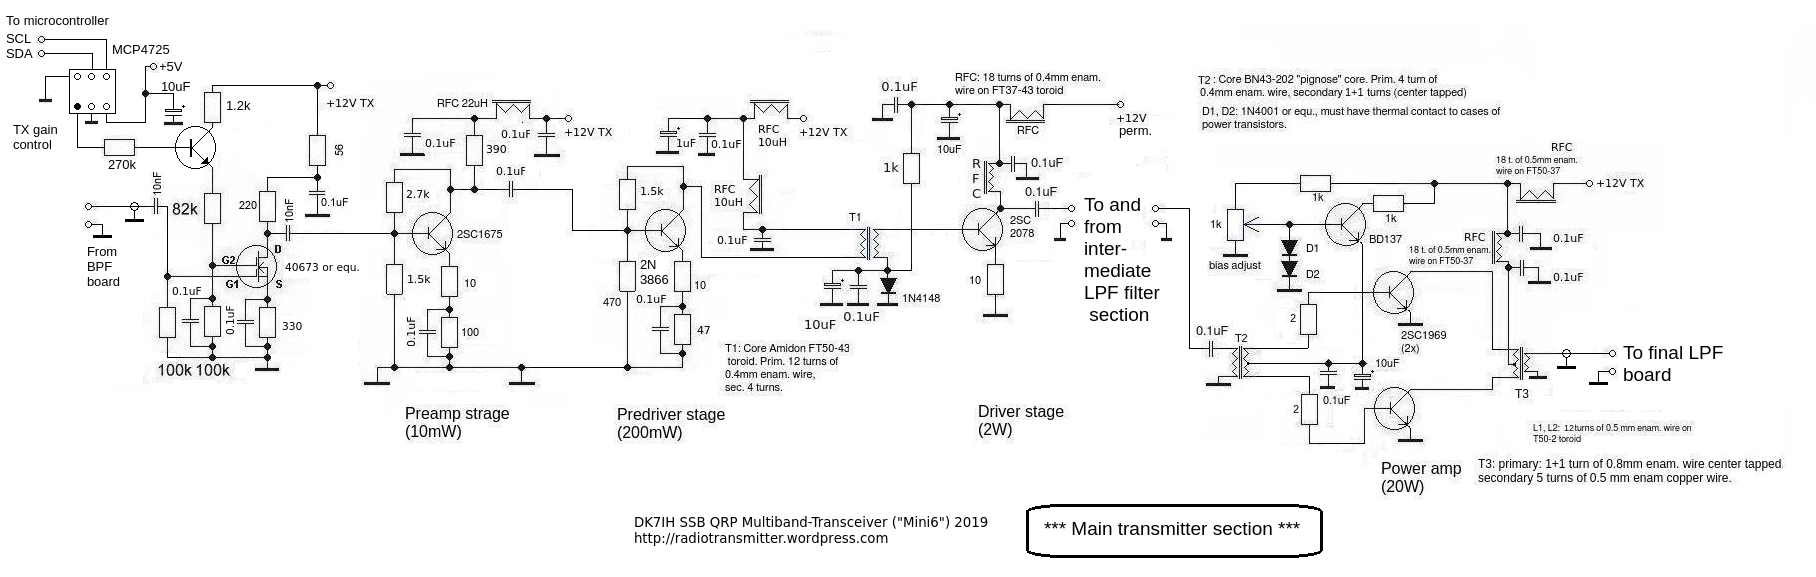 DK7IH 6 band QRP SSB TRX 2019 - Power transmitter